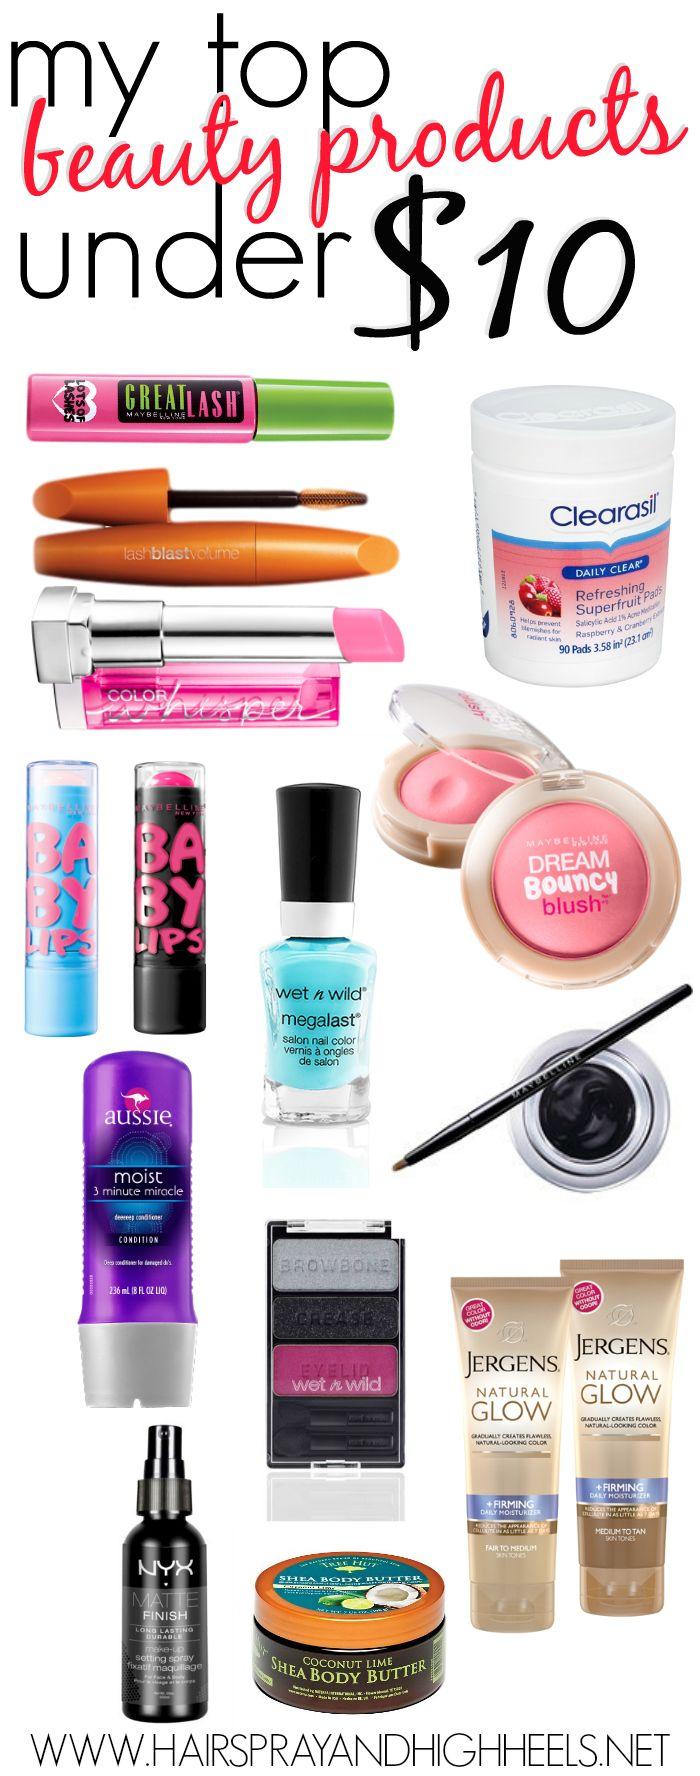 Top Beauty Products Under $10 via @Krista McNamara McNamara McNamara McNamara Knight and HighHeels                                                                                                            Hairspray and HighHeels